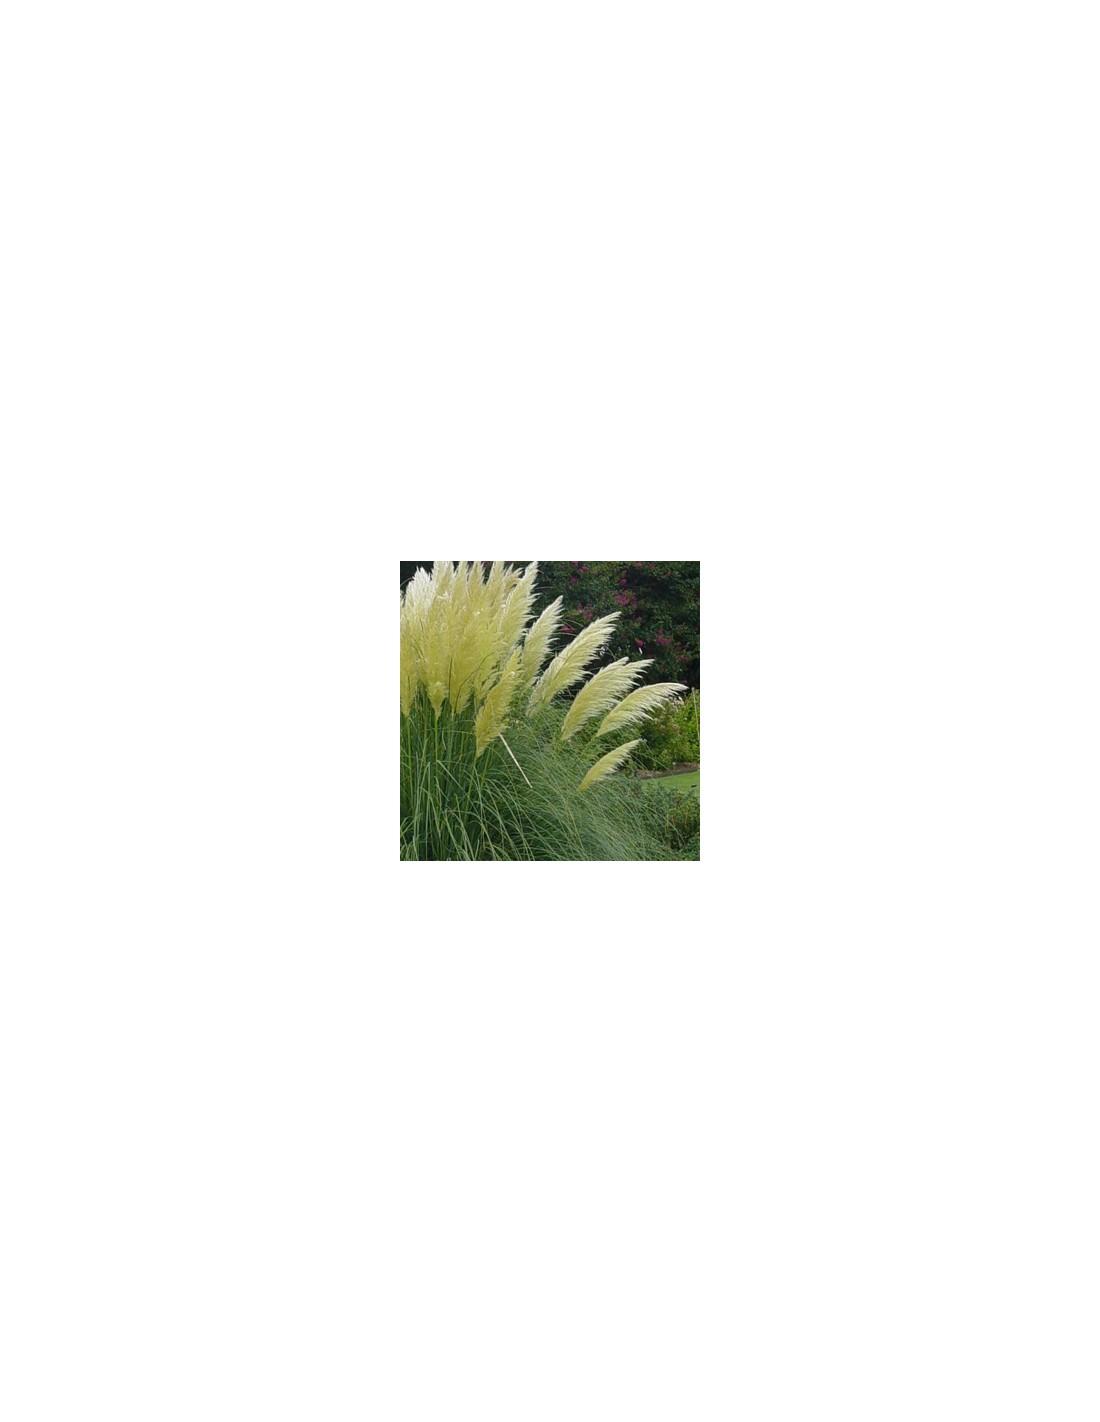 Herbe de la pampa les jardins d 39 hauti re - Herbe de la pampa prix ...